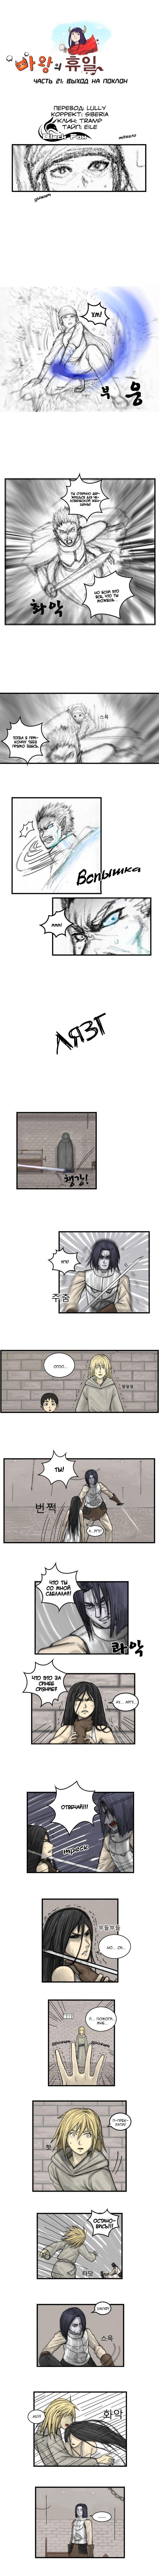 https://r1.ninemanga.com/comics/pic2/23/27095/304983/1467666962445.jpg Page 1